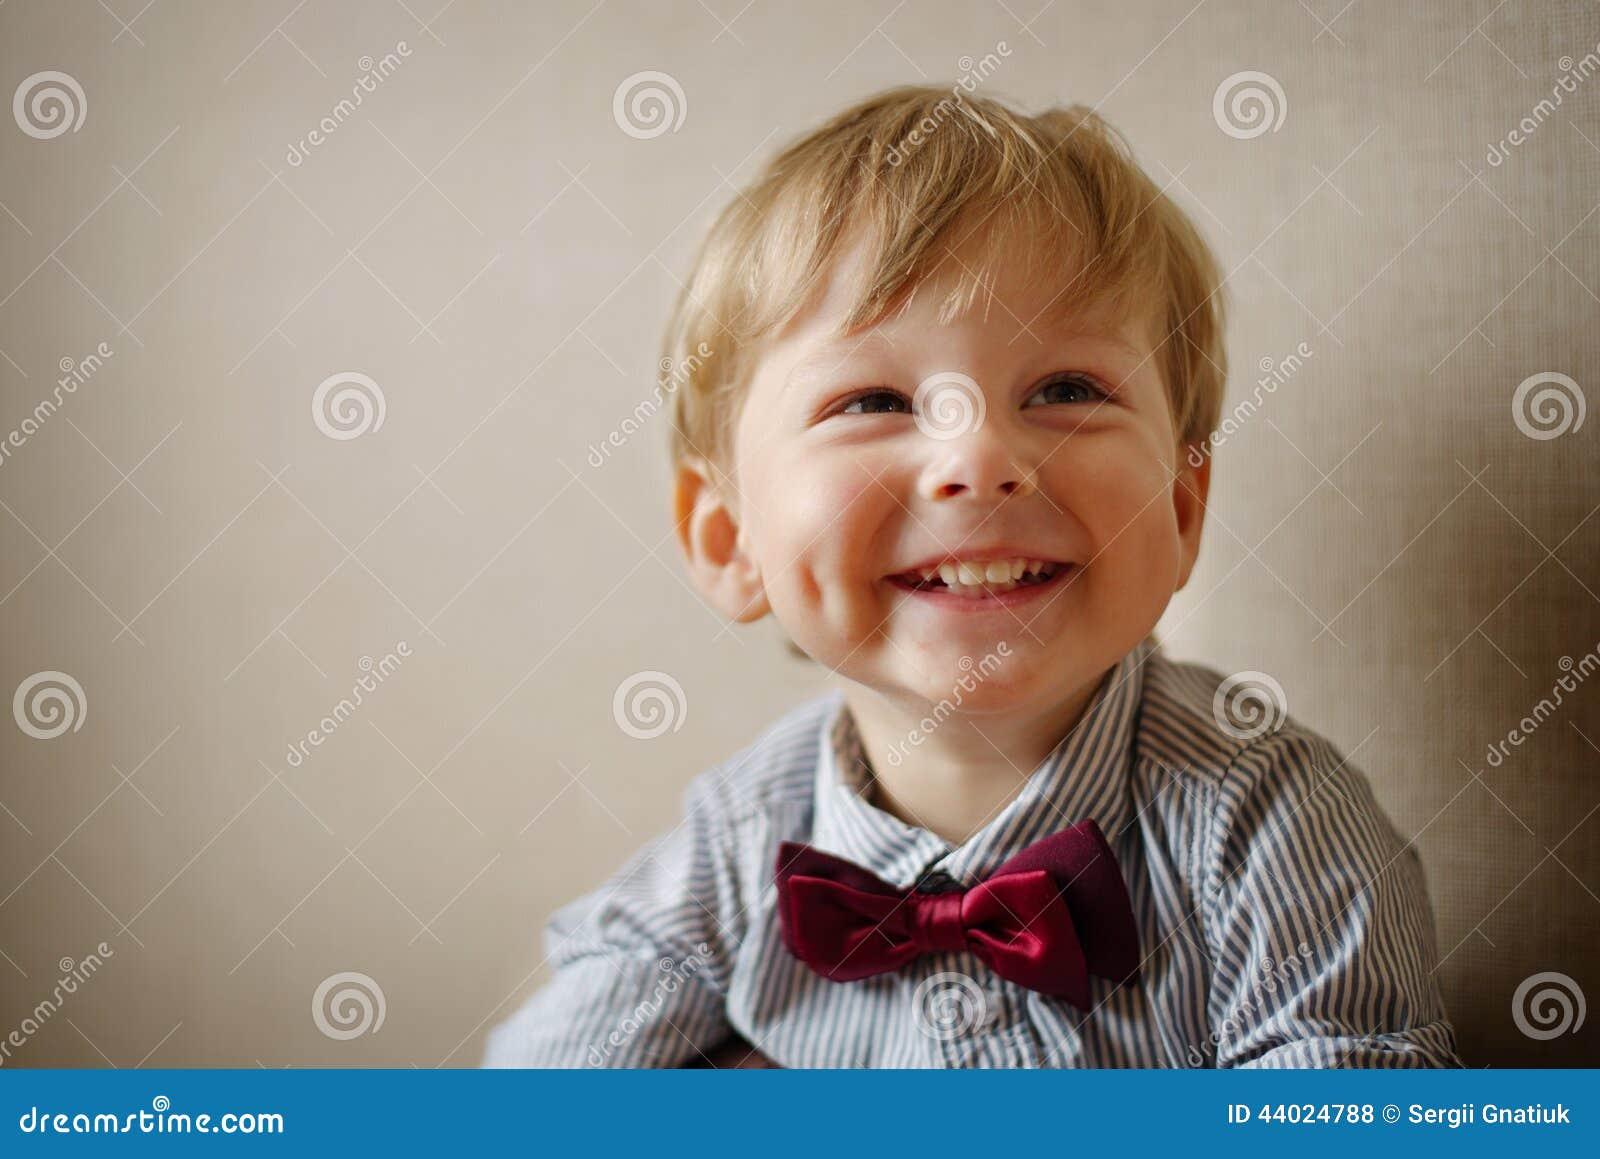 Дрочка молодого мальчика на веб камеру фото 706-162